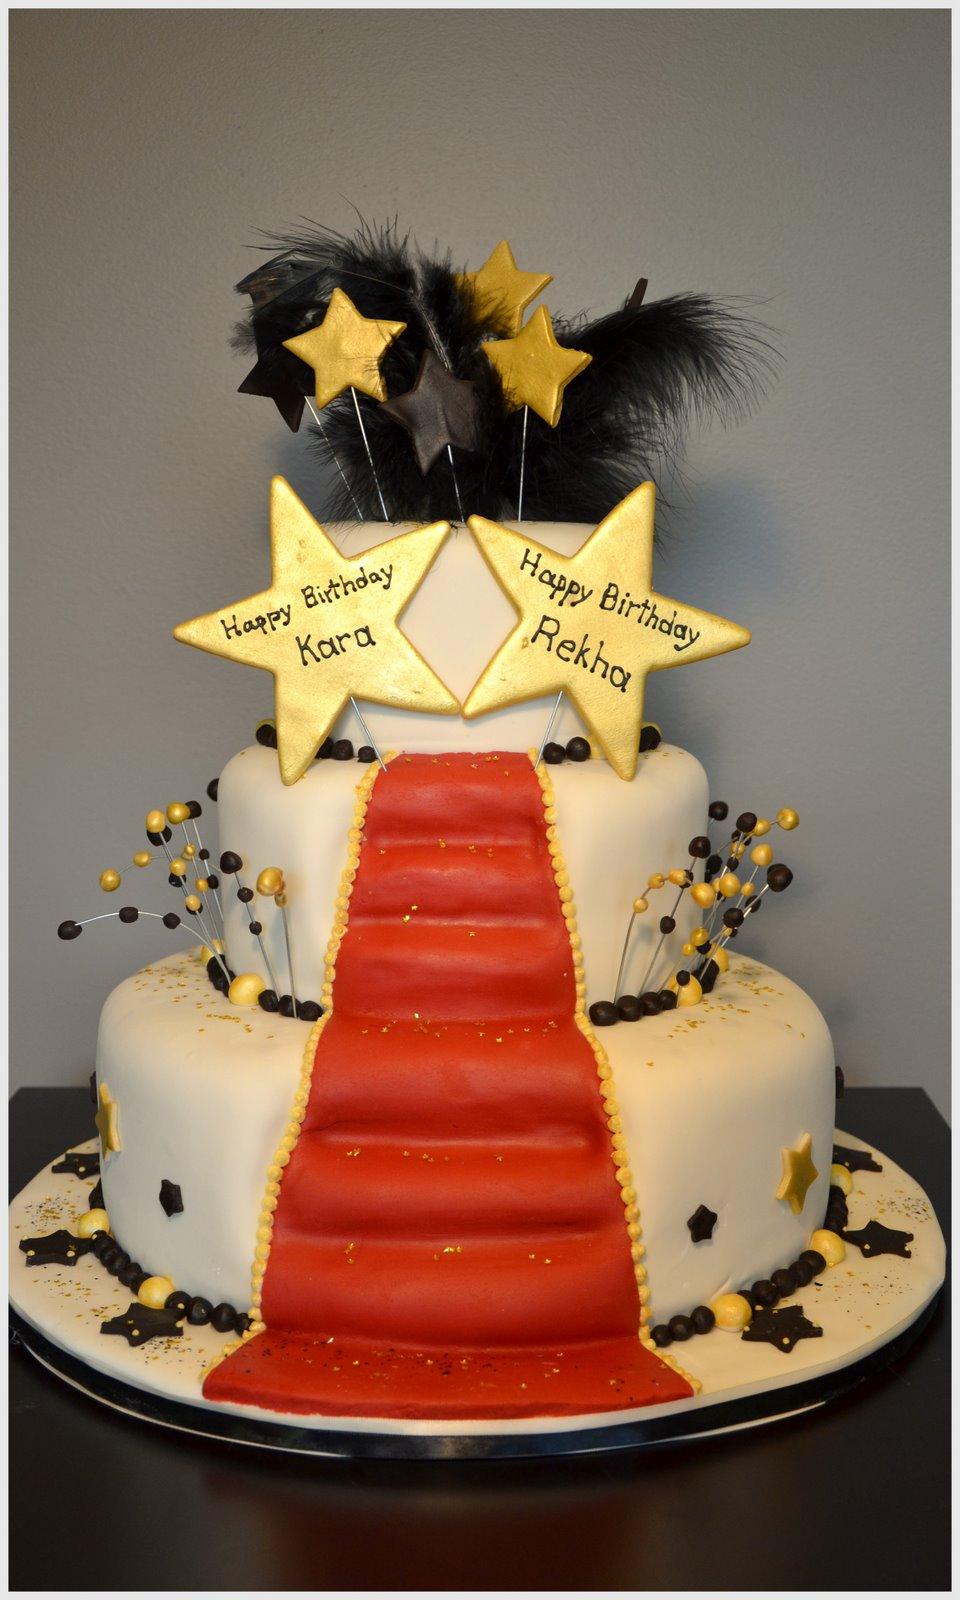 Cake By Alana November 2011